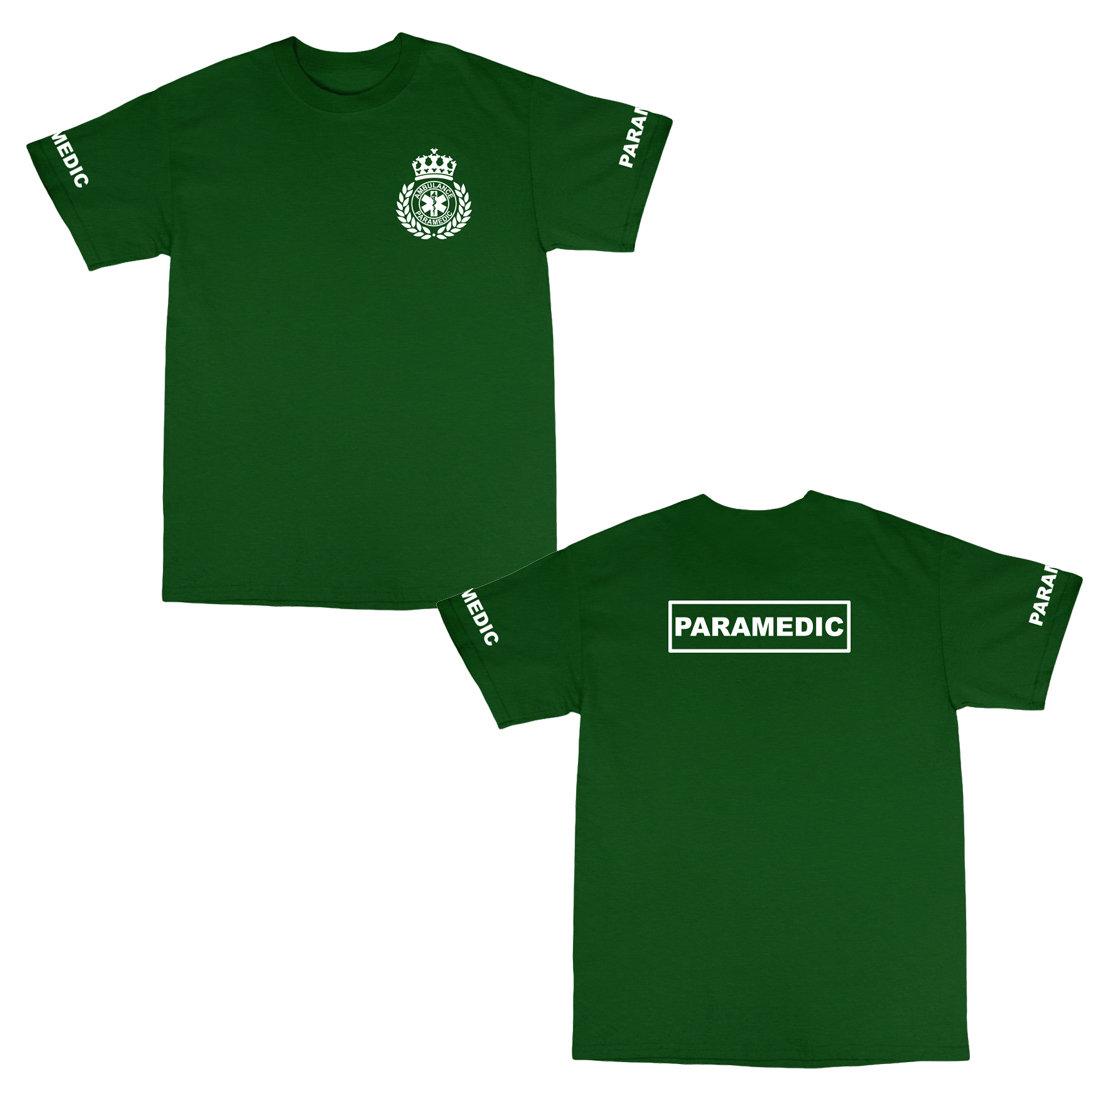 Children's 'Paramedic' T-Shirt ChildParamedicT